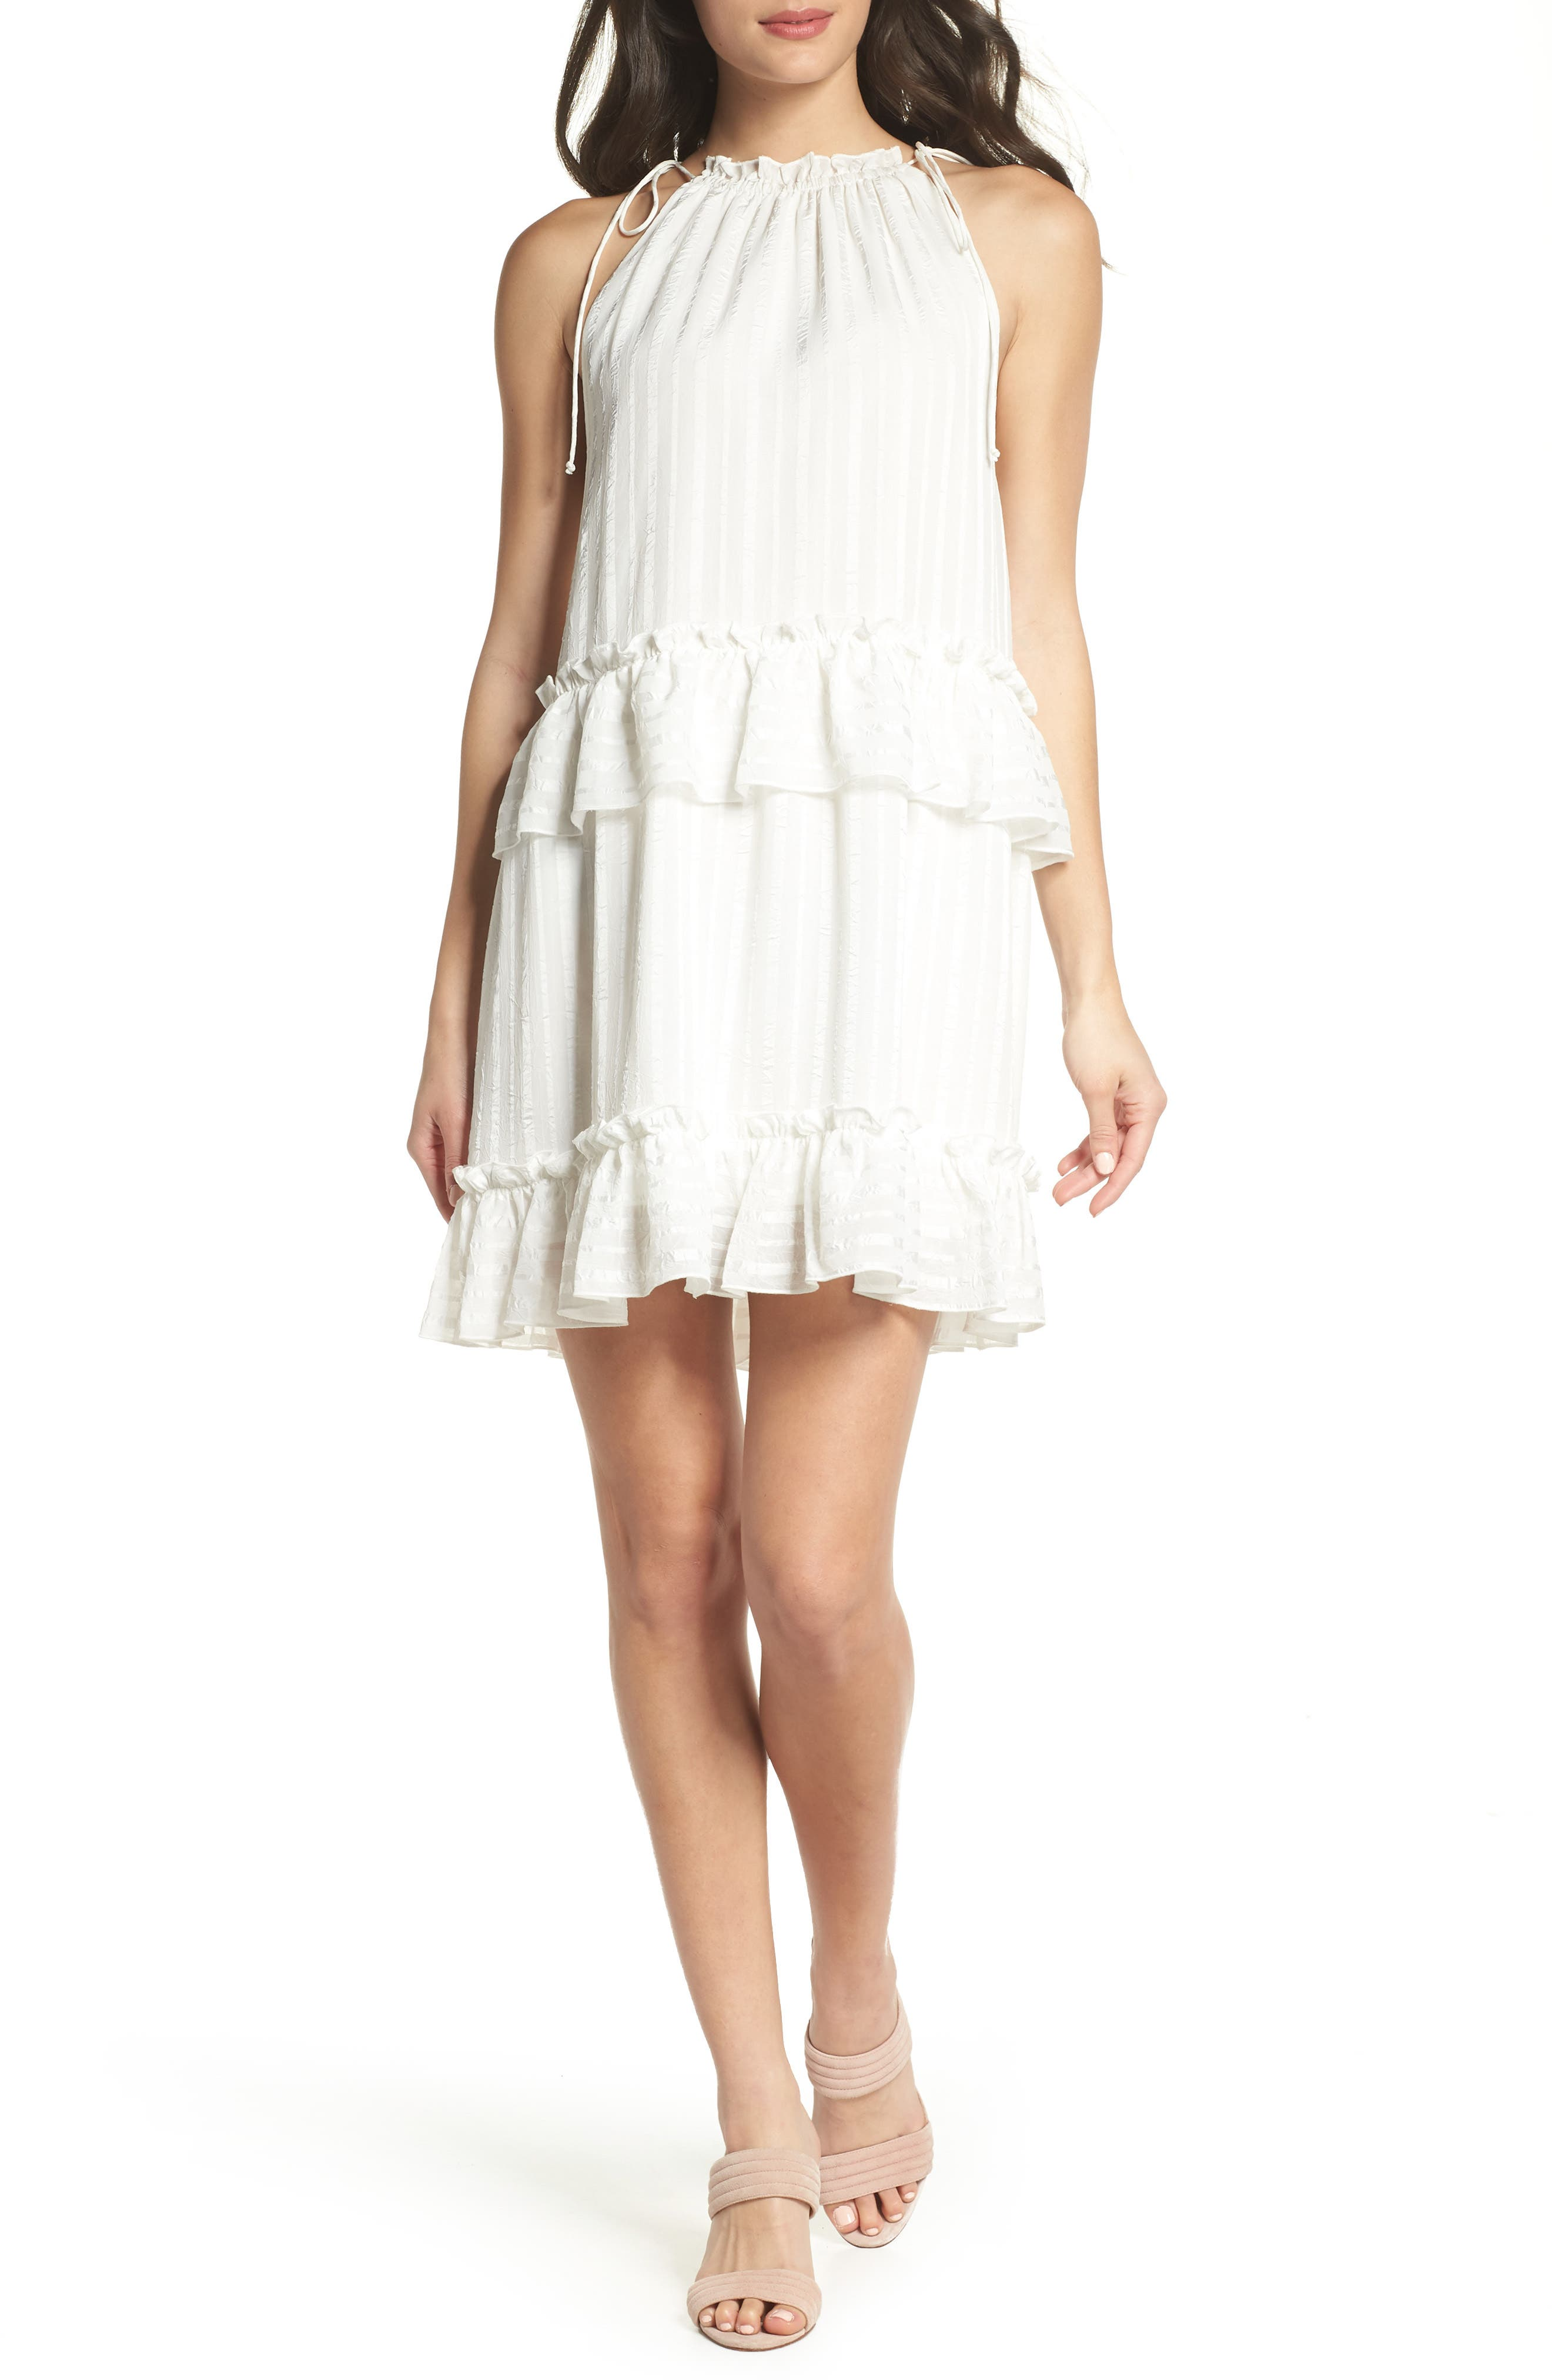 NSR Lila Stripe Chiffon Halter Dress